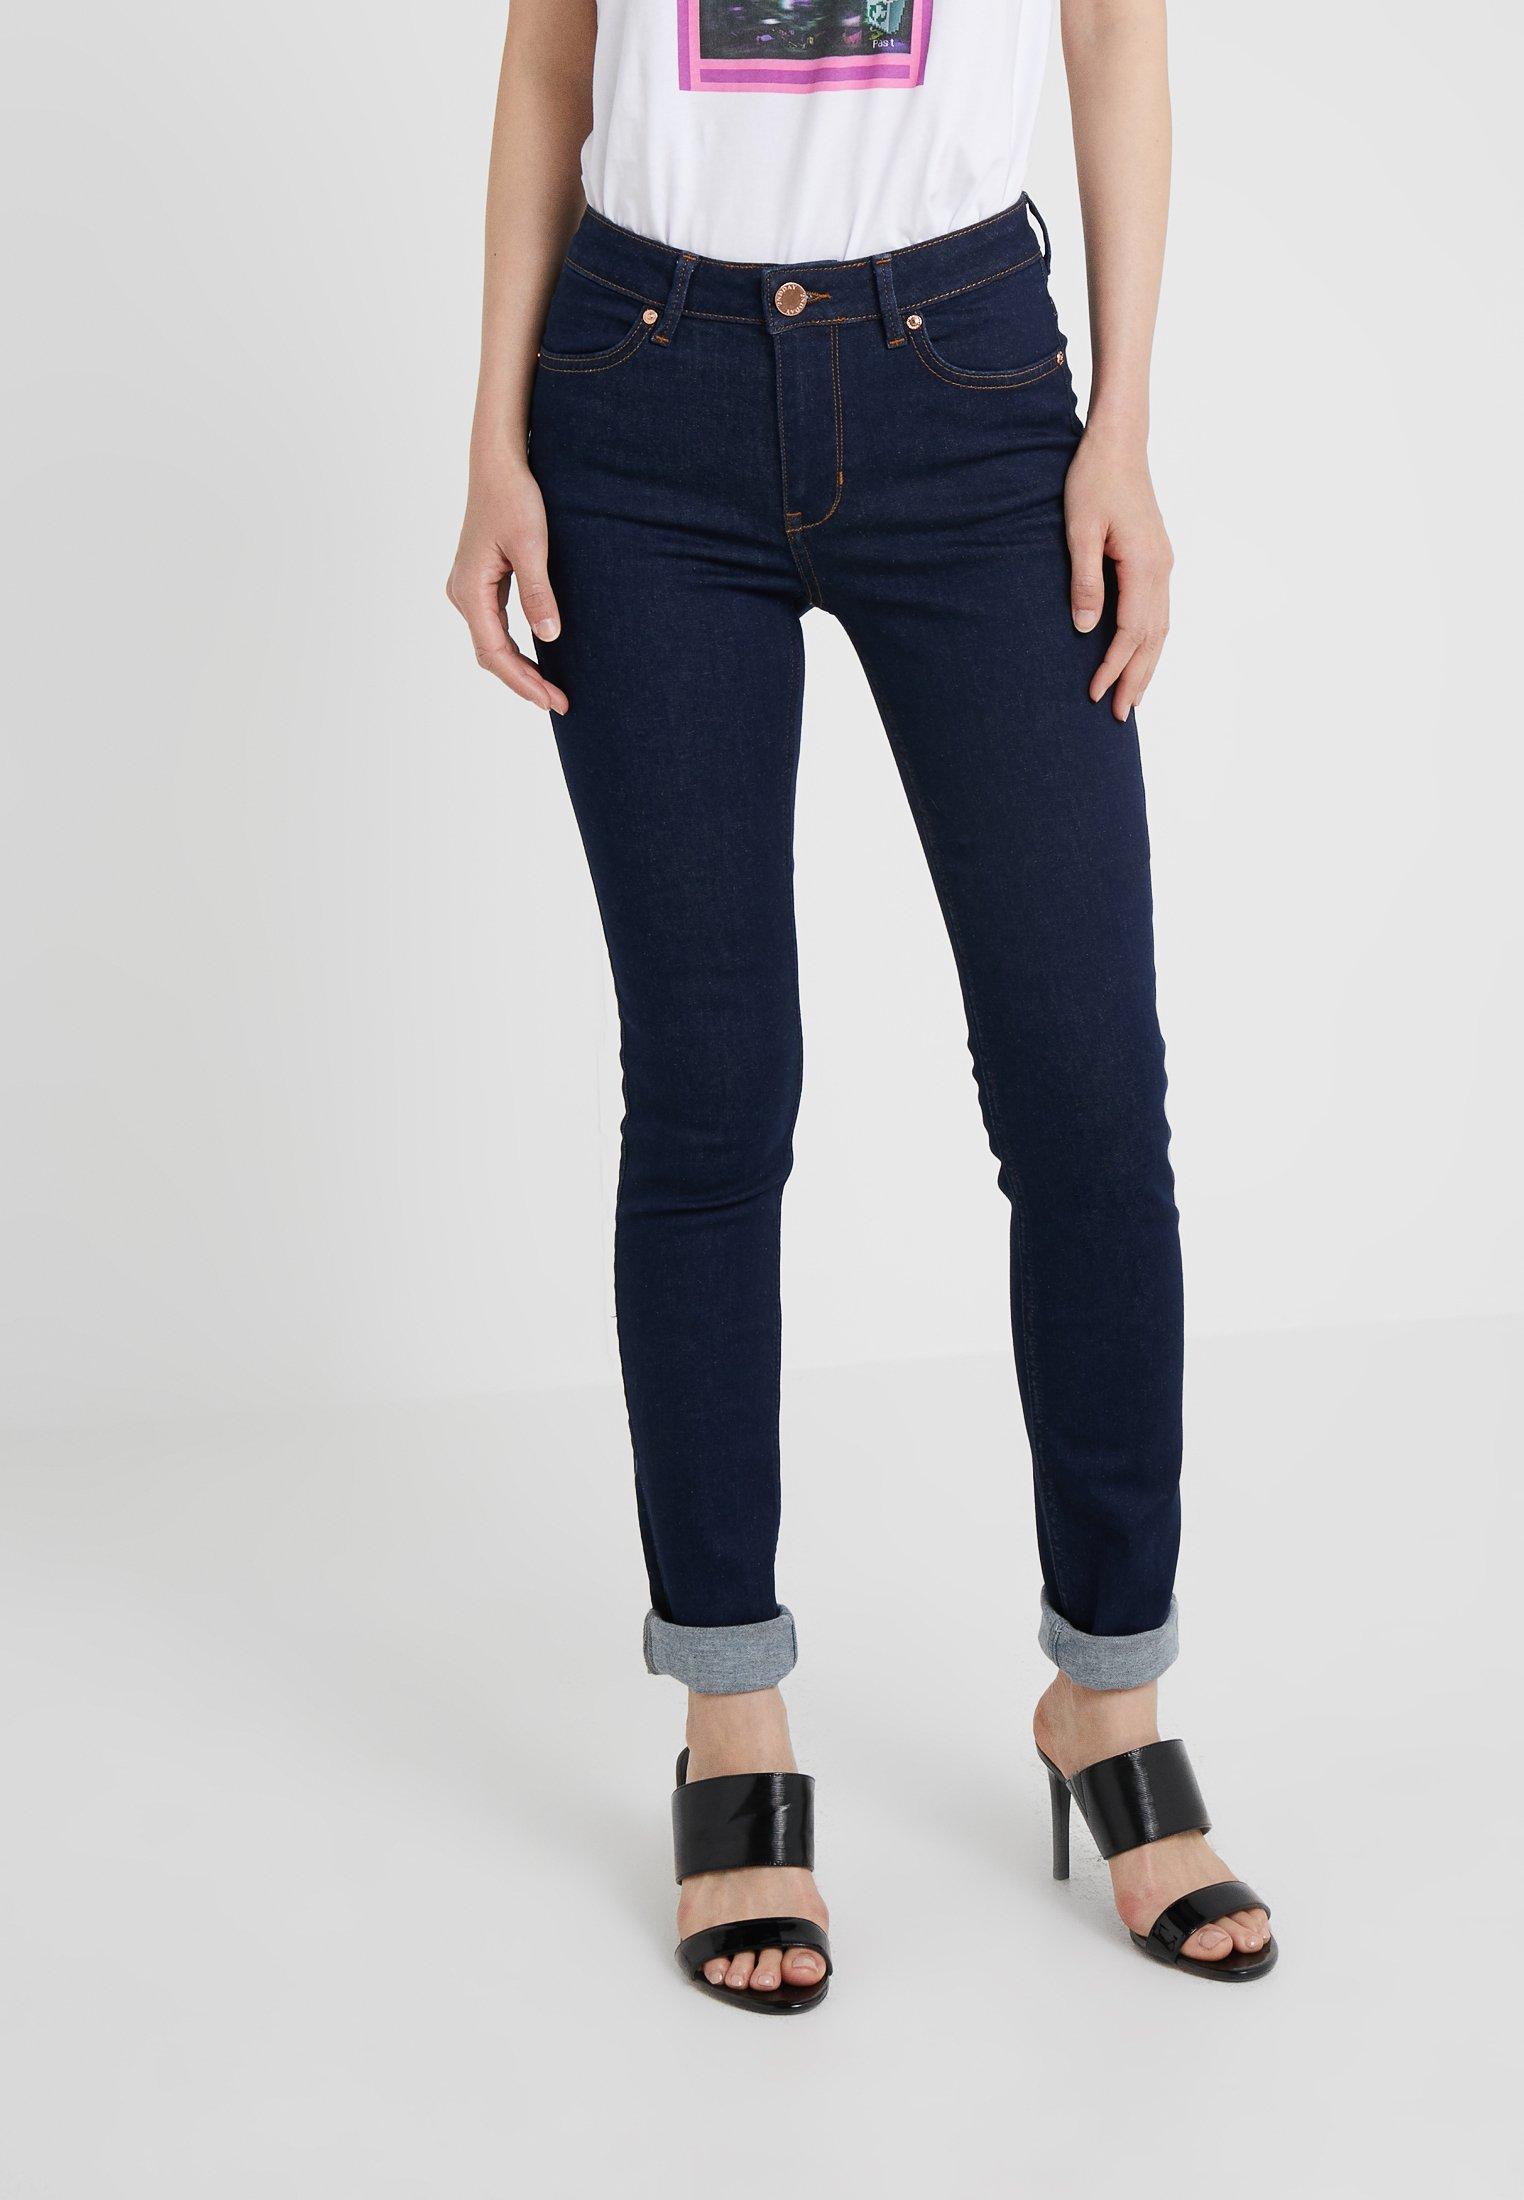 Dark Jenna Skinny 2nd Blue Day SapphireJeans srhxtdQC